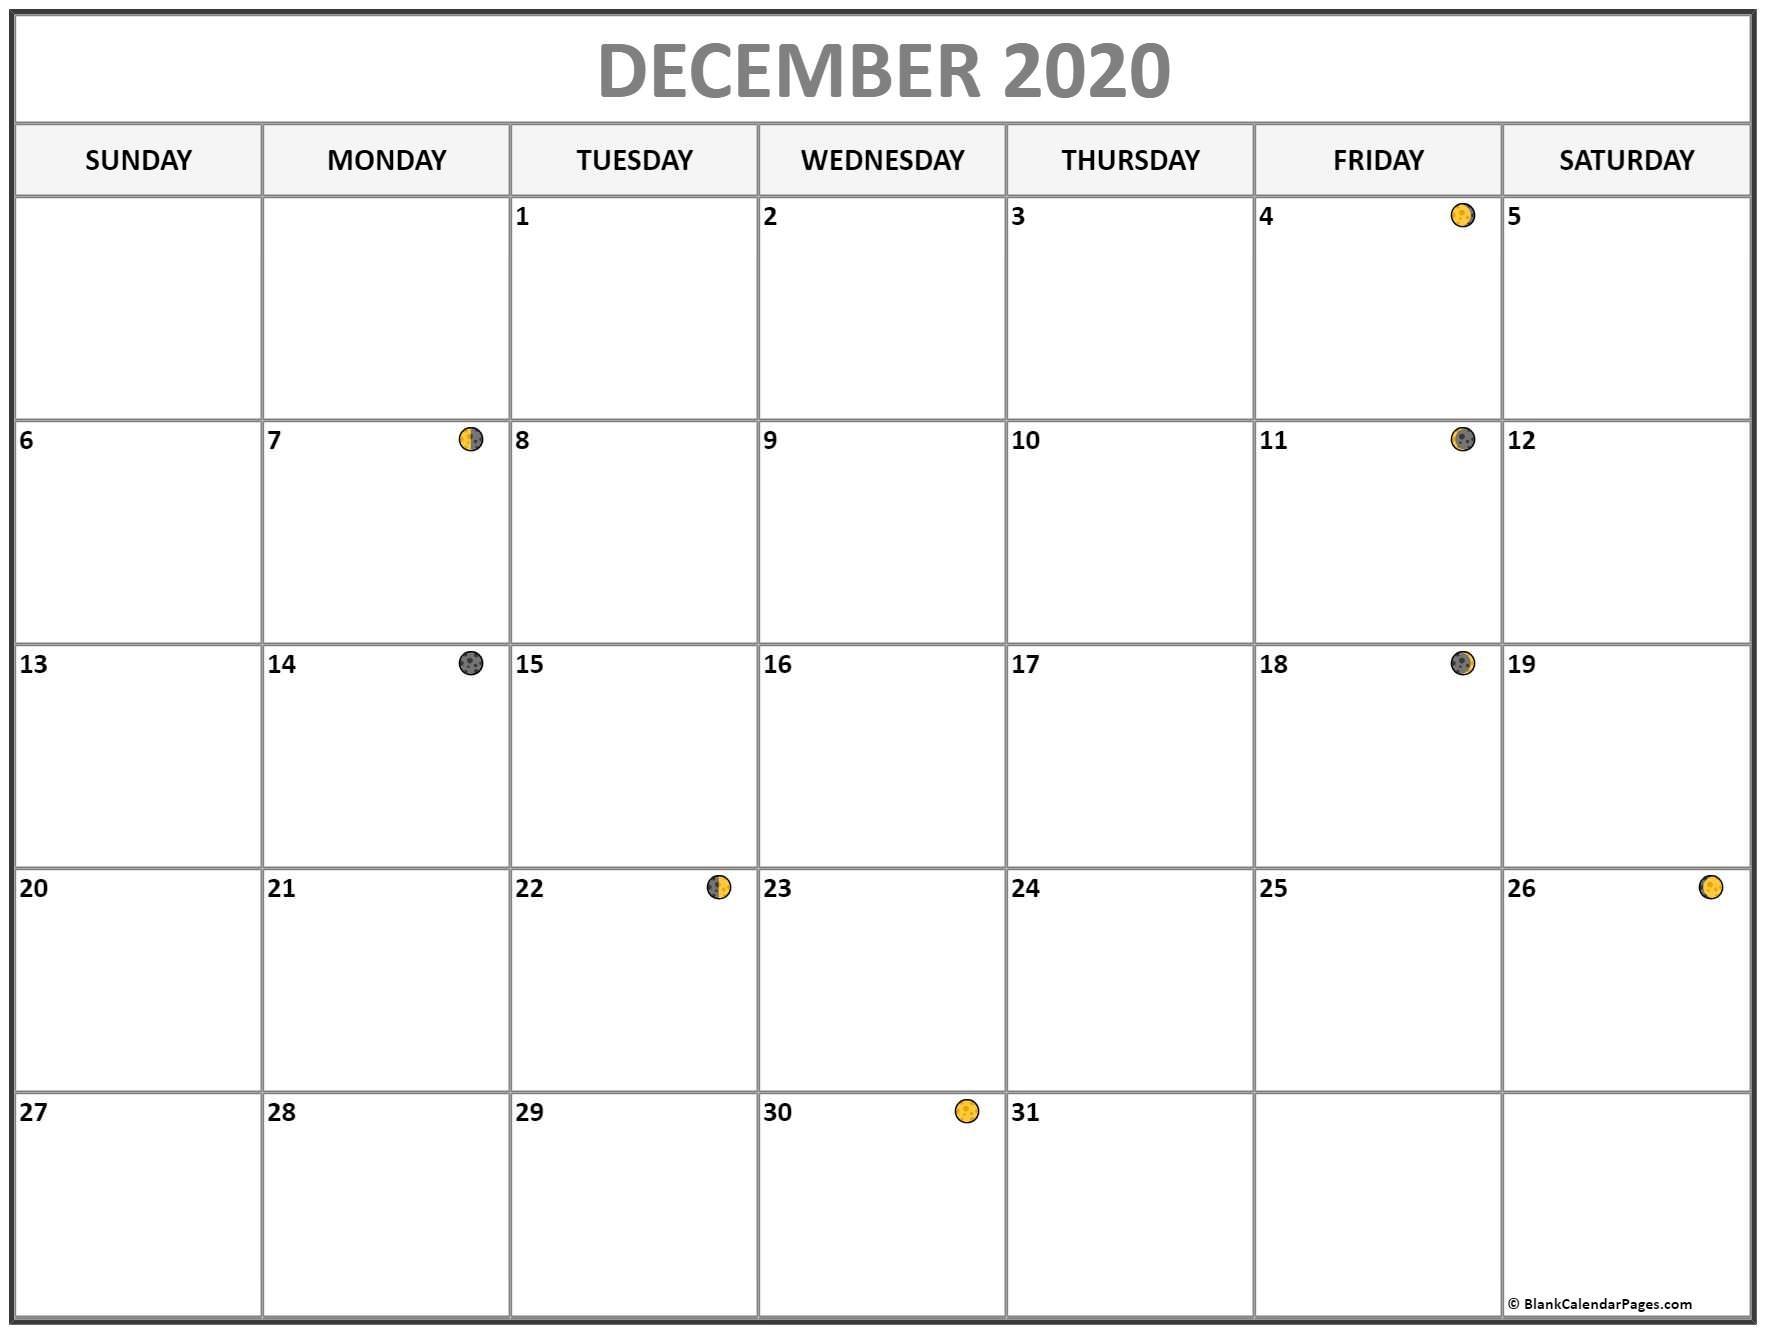 December 2020 Lunar Calendar | Moon Phase Calendar  Solar Lunar Calendar 2020